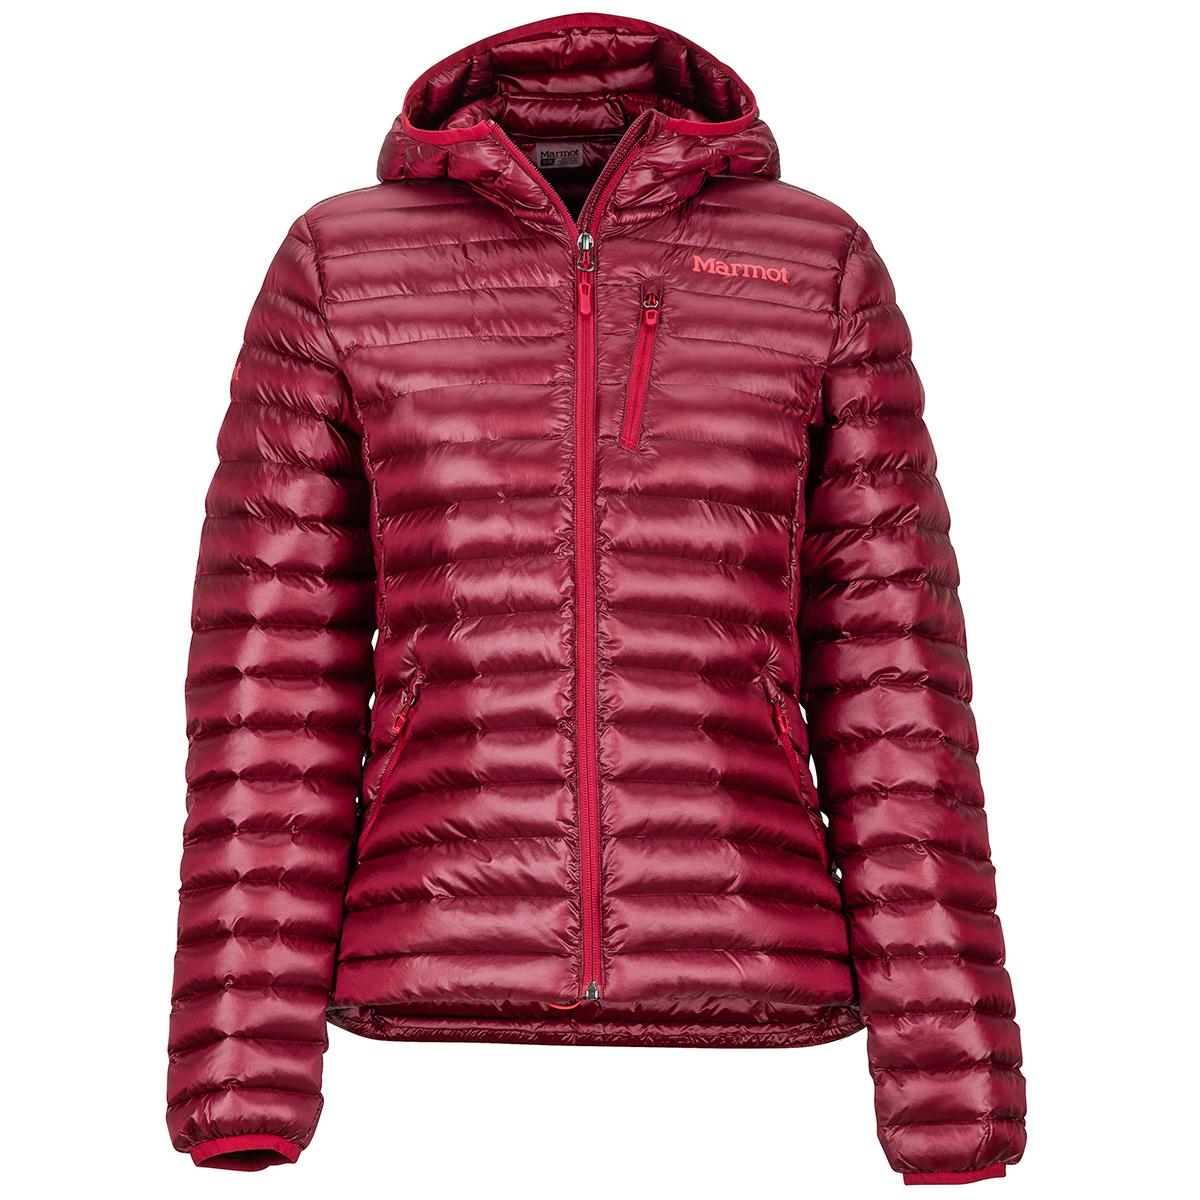 Marmot Women's Avant Featherless Hoodie - Red, L